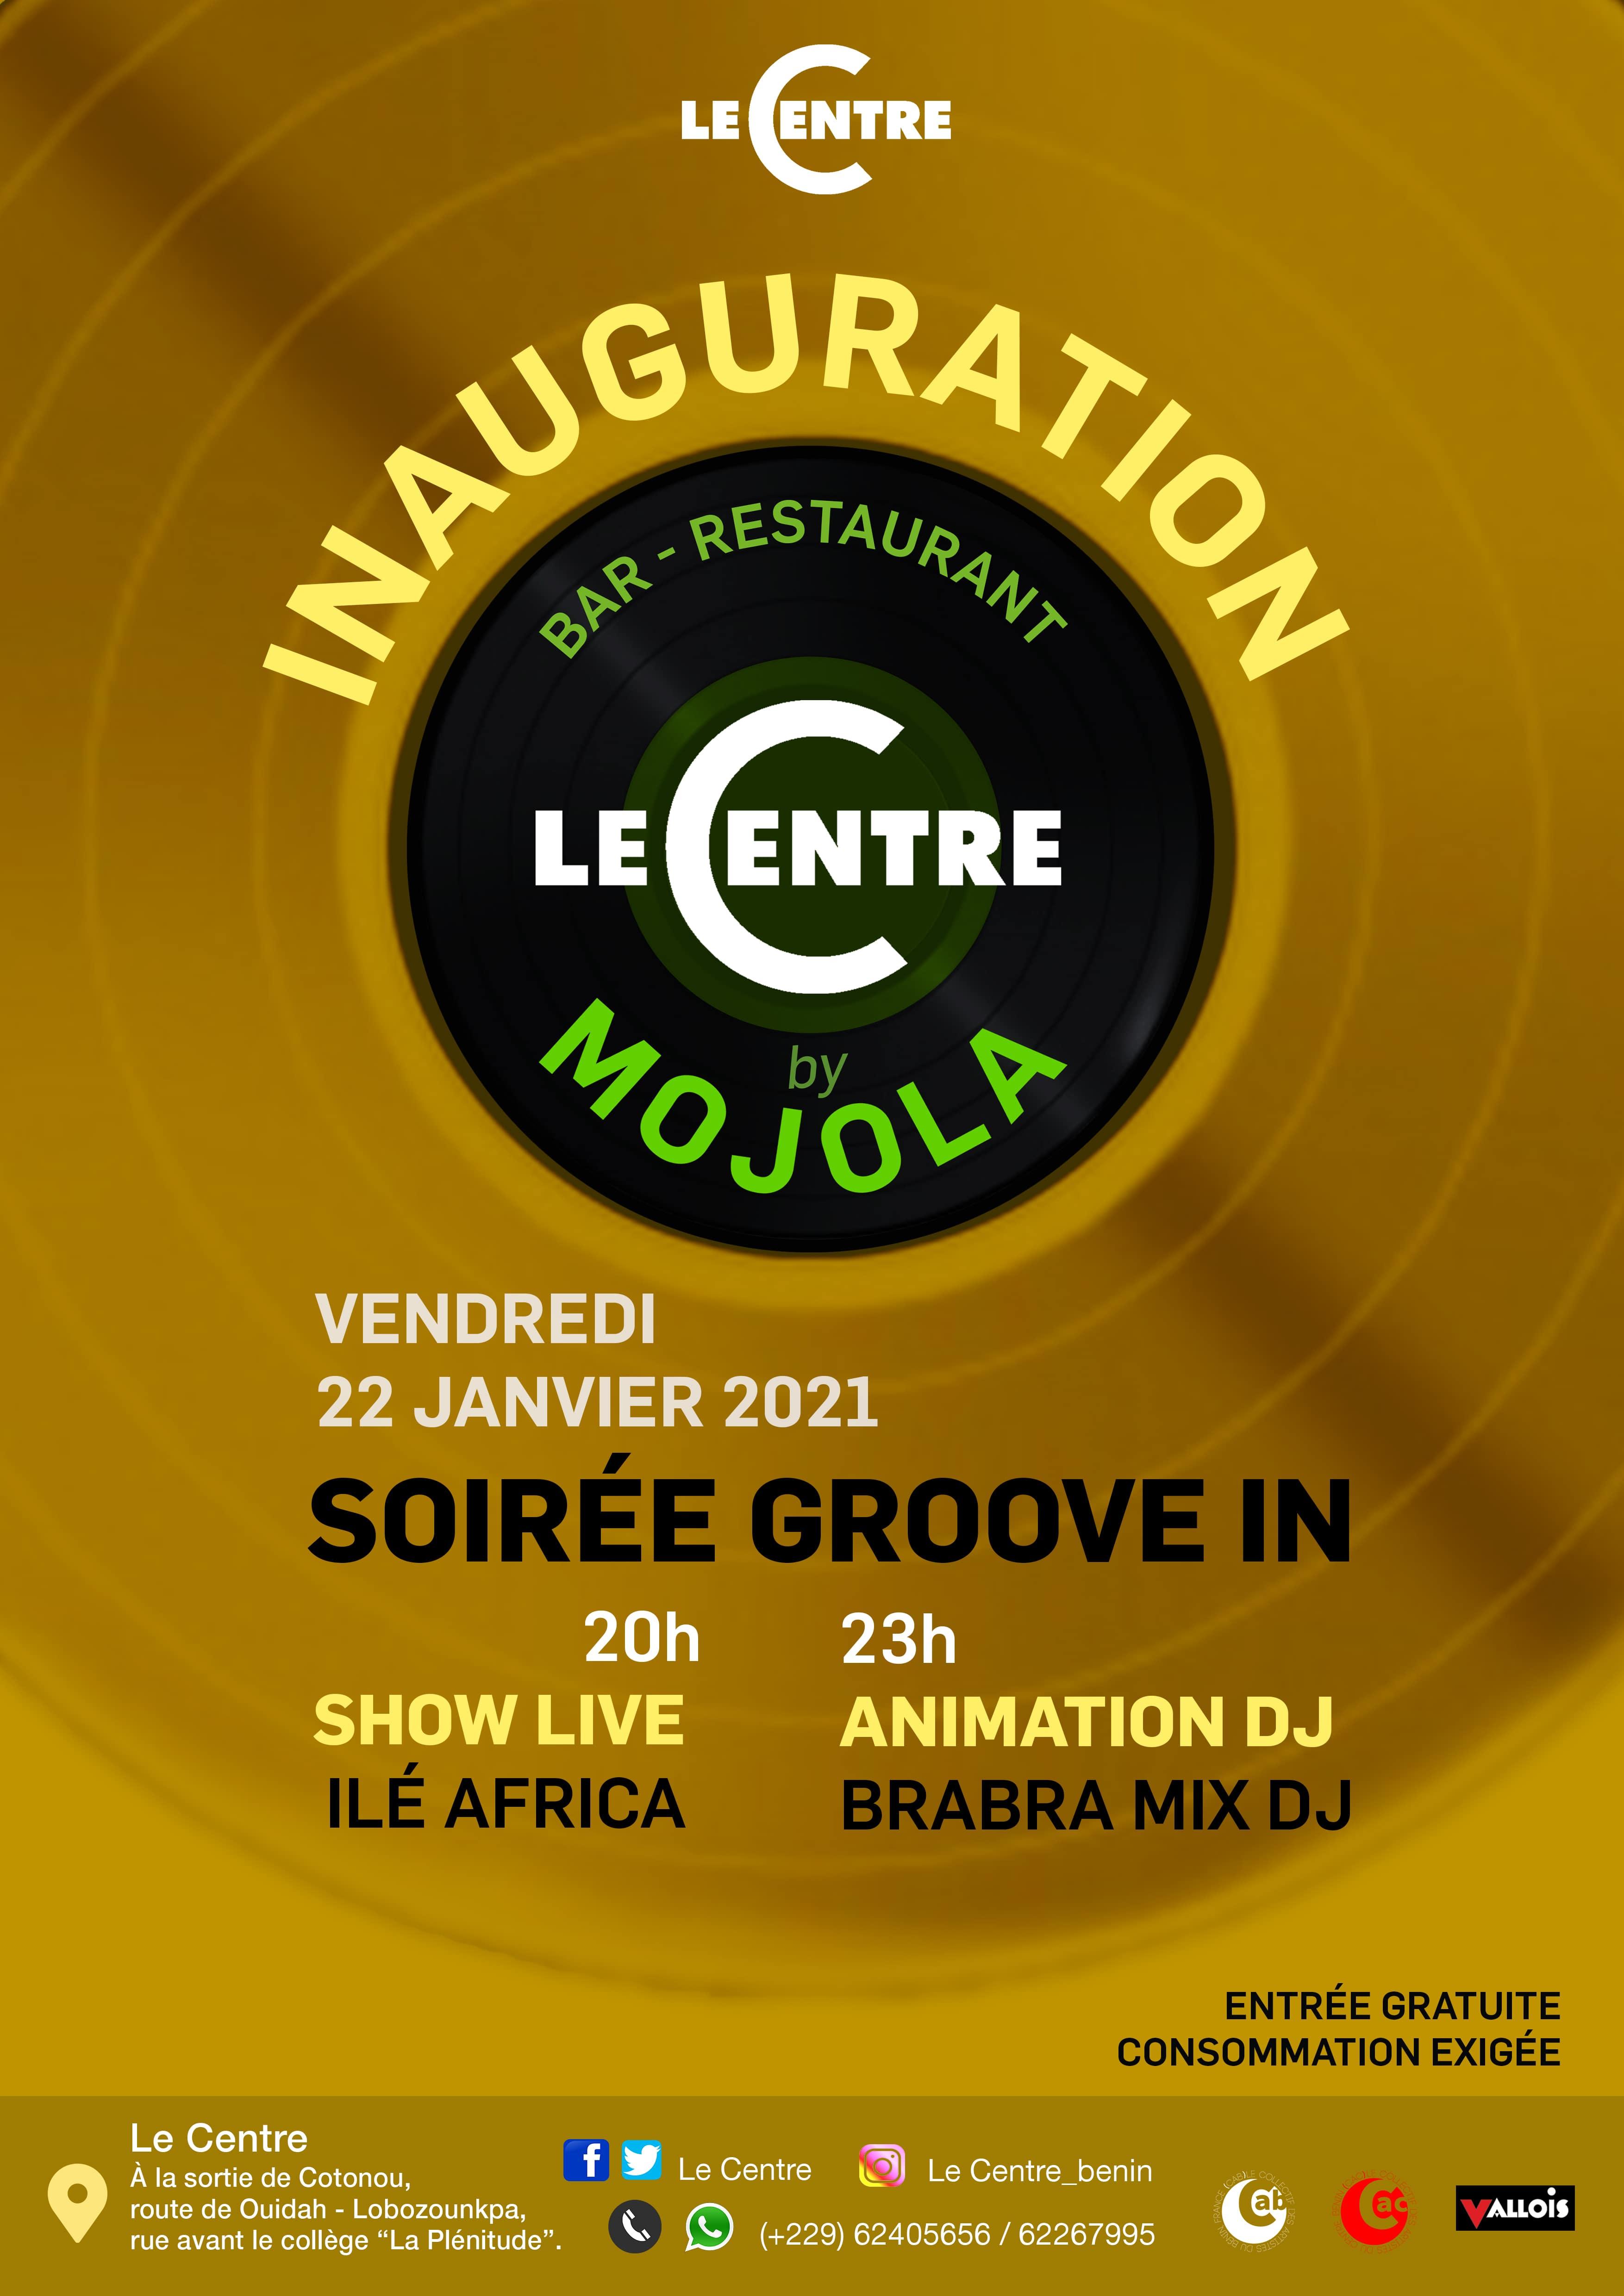 Inauguration : Le Centre by Mojola